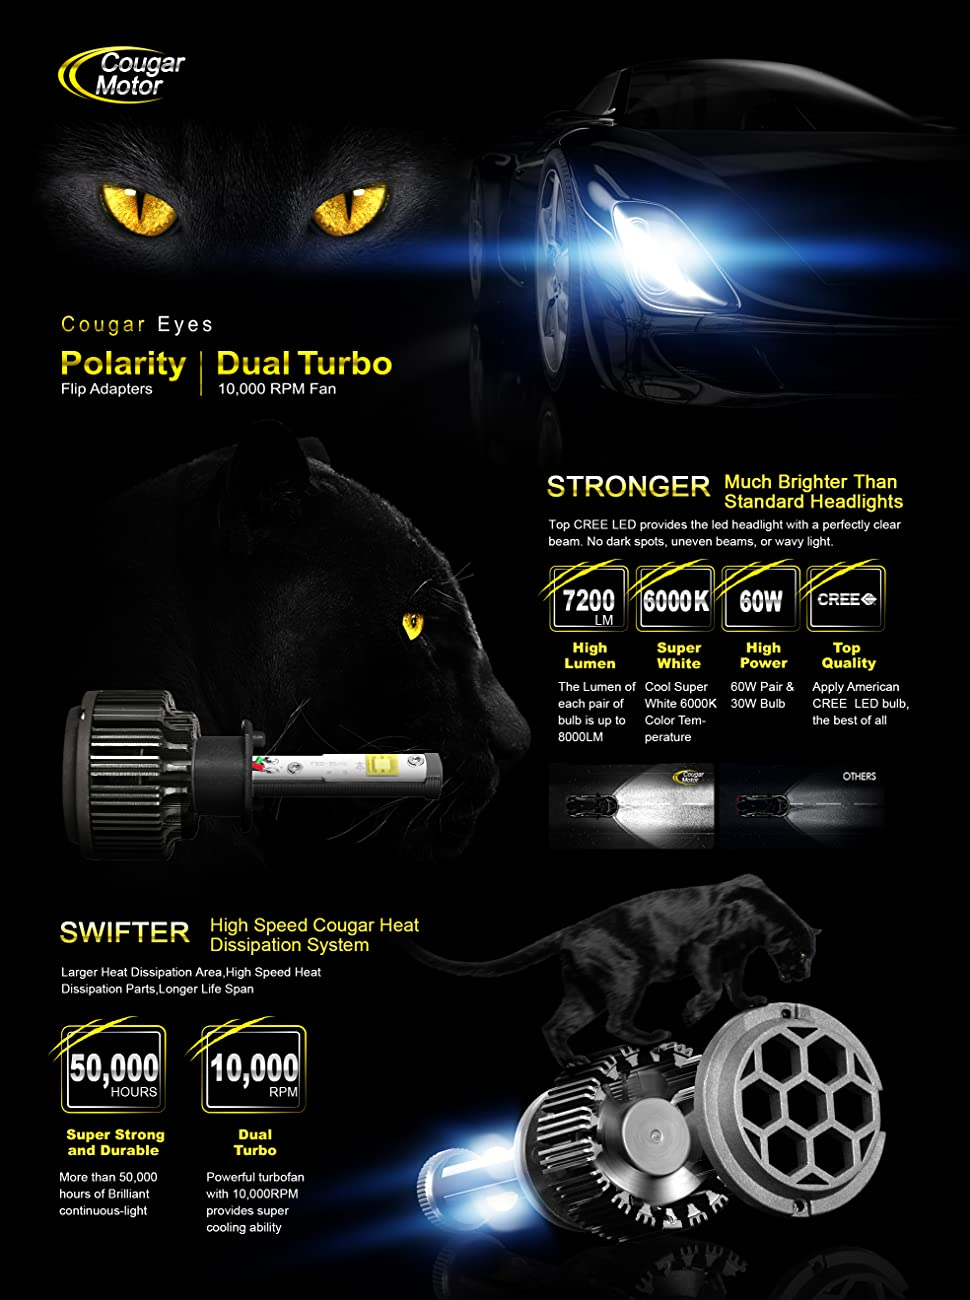 Amazon cougarmotor led headlight bulbs all in one conversion cougar motor h1 led headlight kit nvjuhfo Gallery